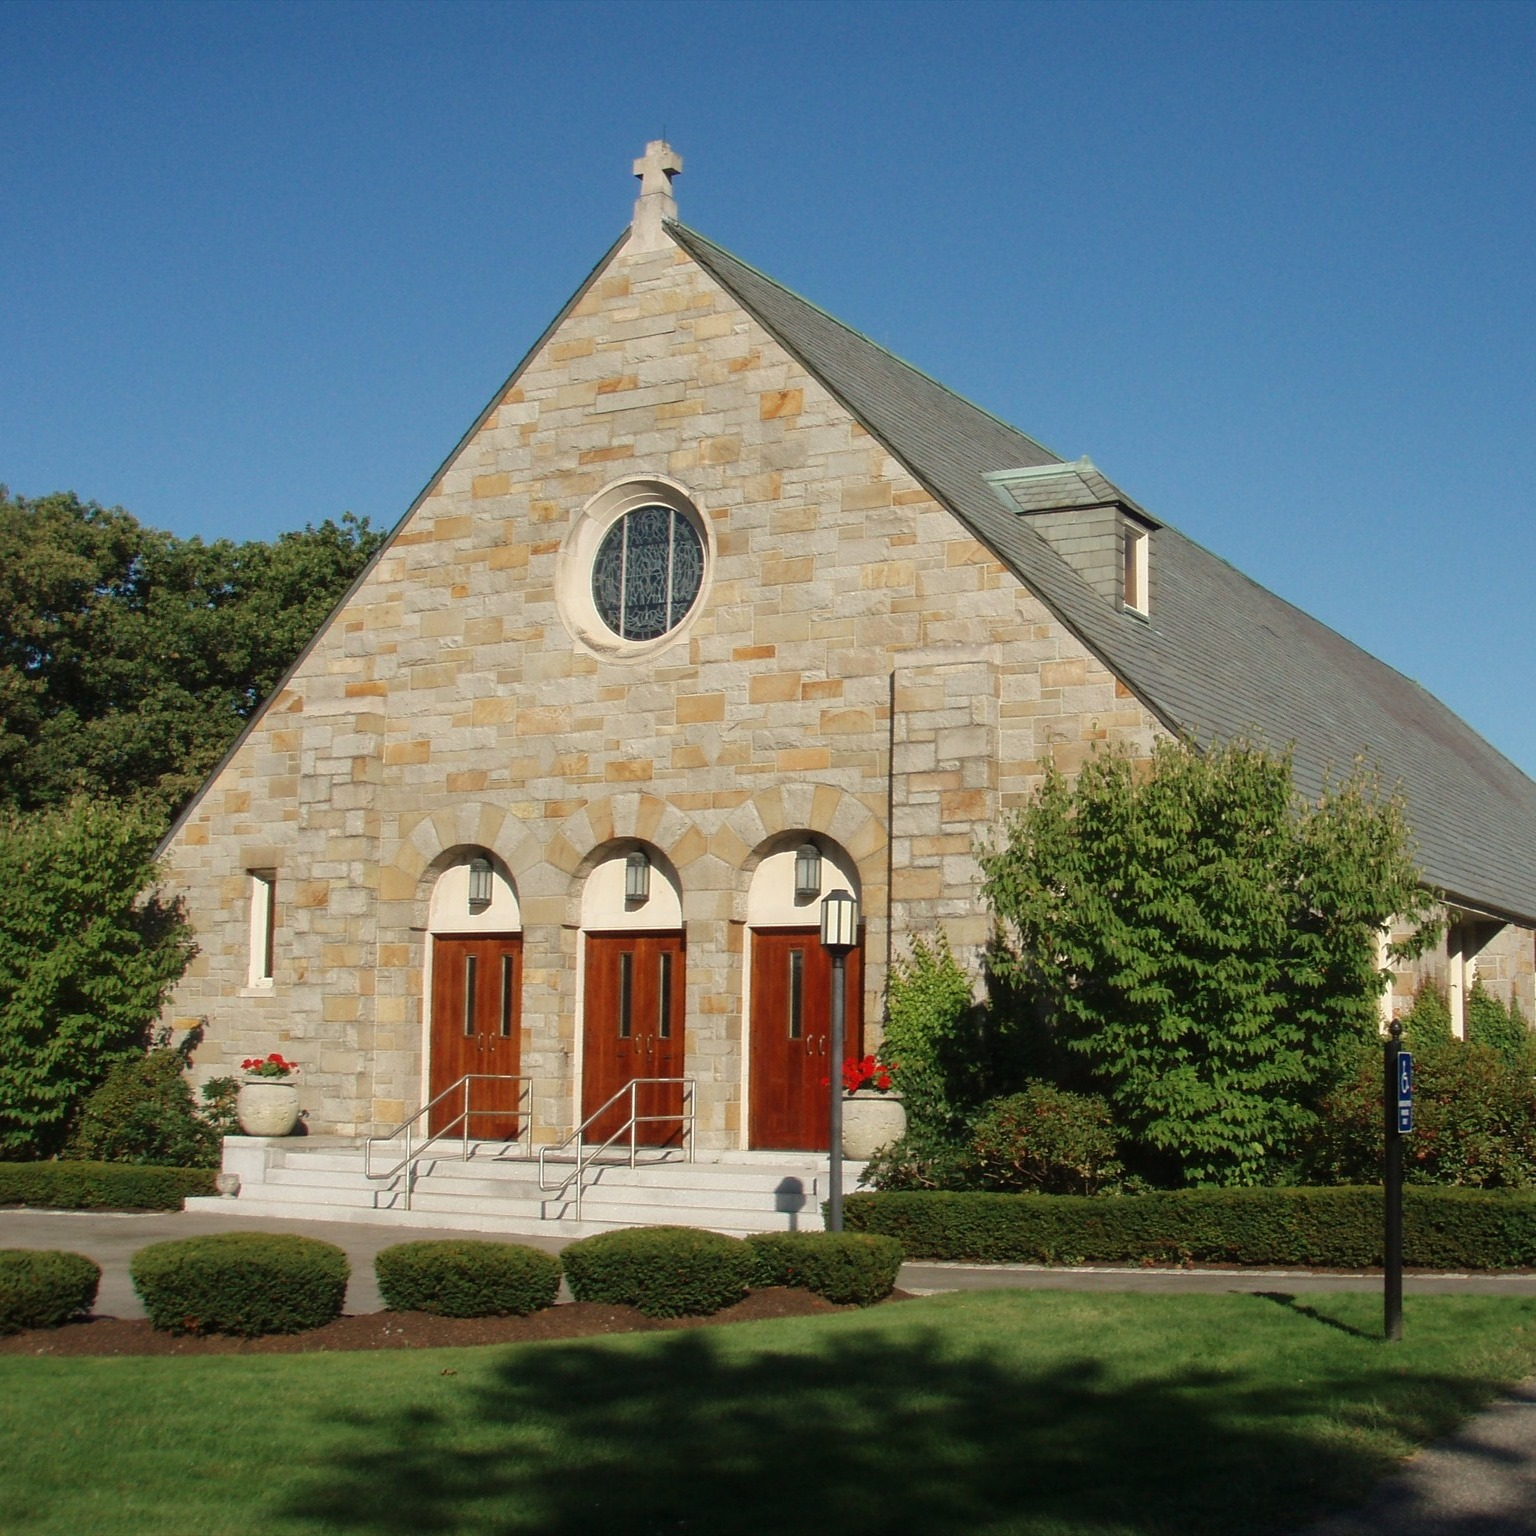 St. Theresa Parish Center